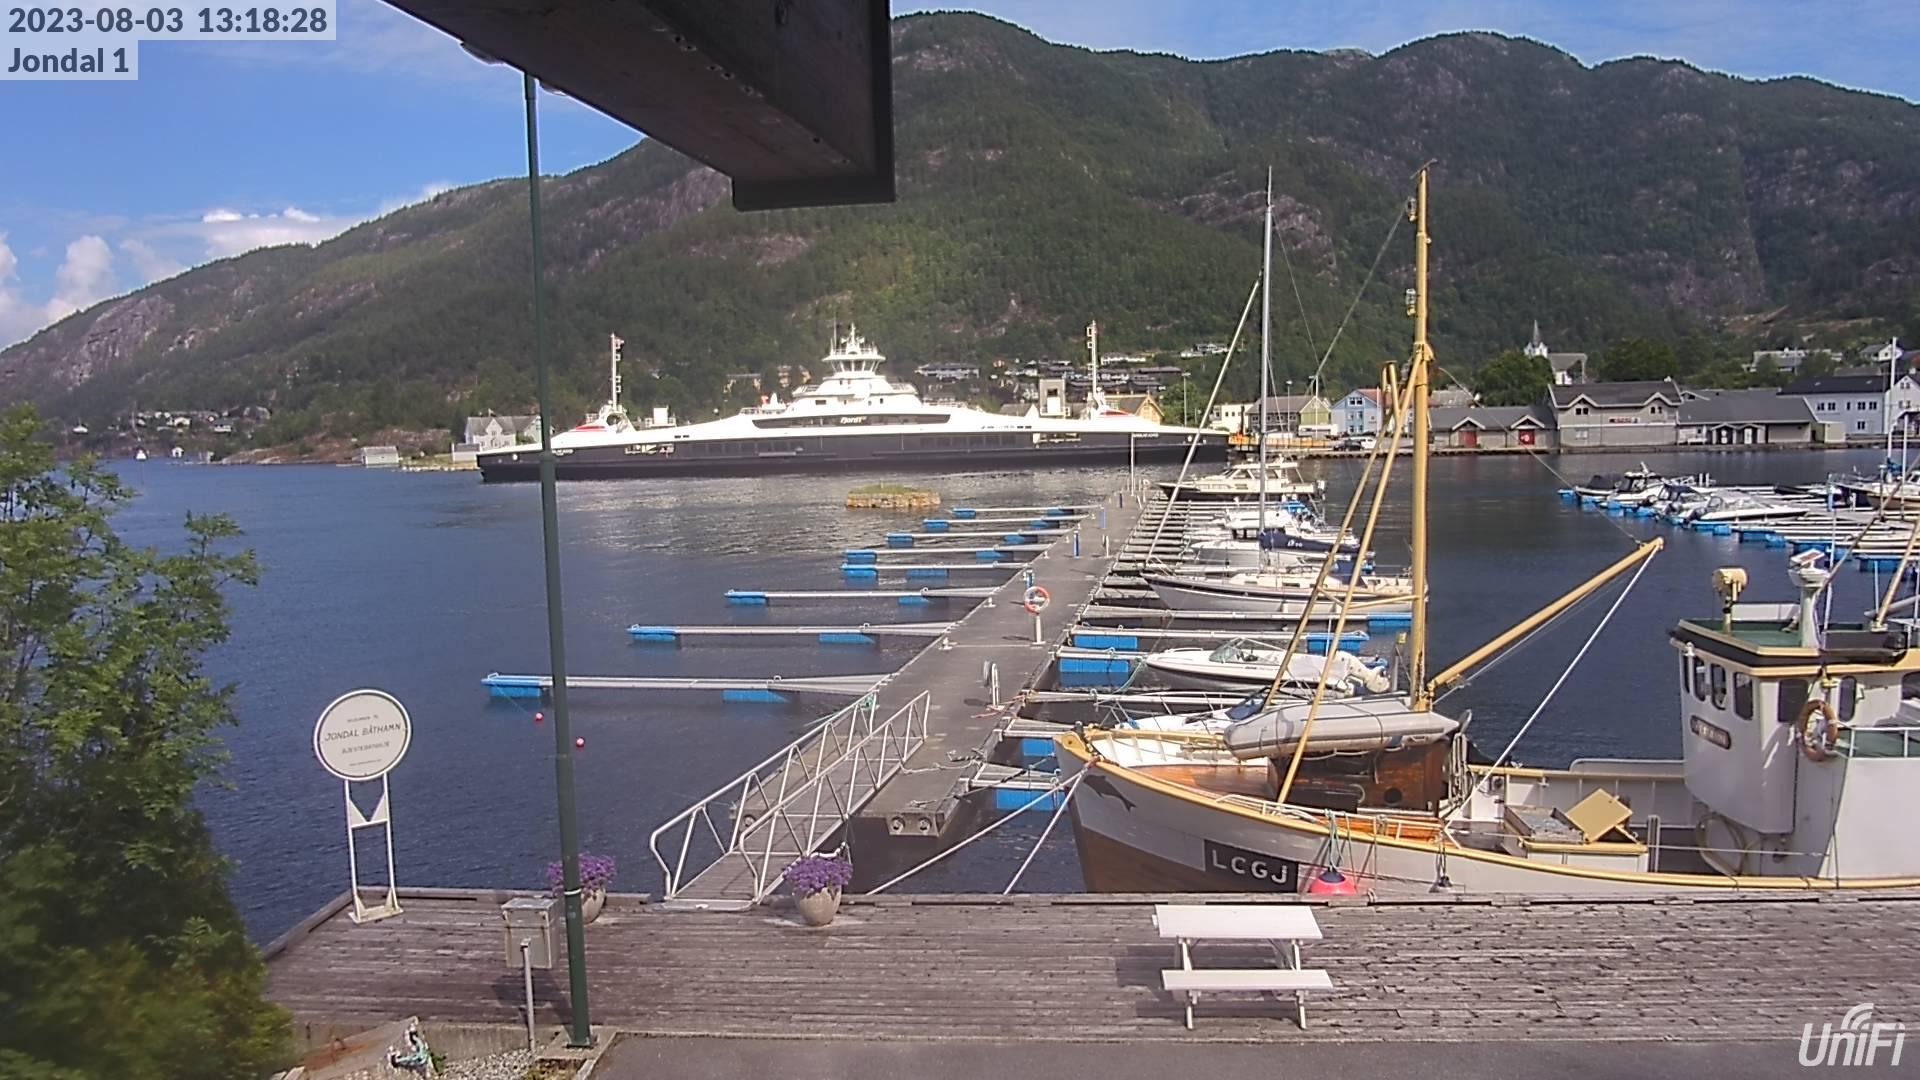 Webcam Jondal, Jondal, Hordaland, Norwegen